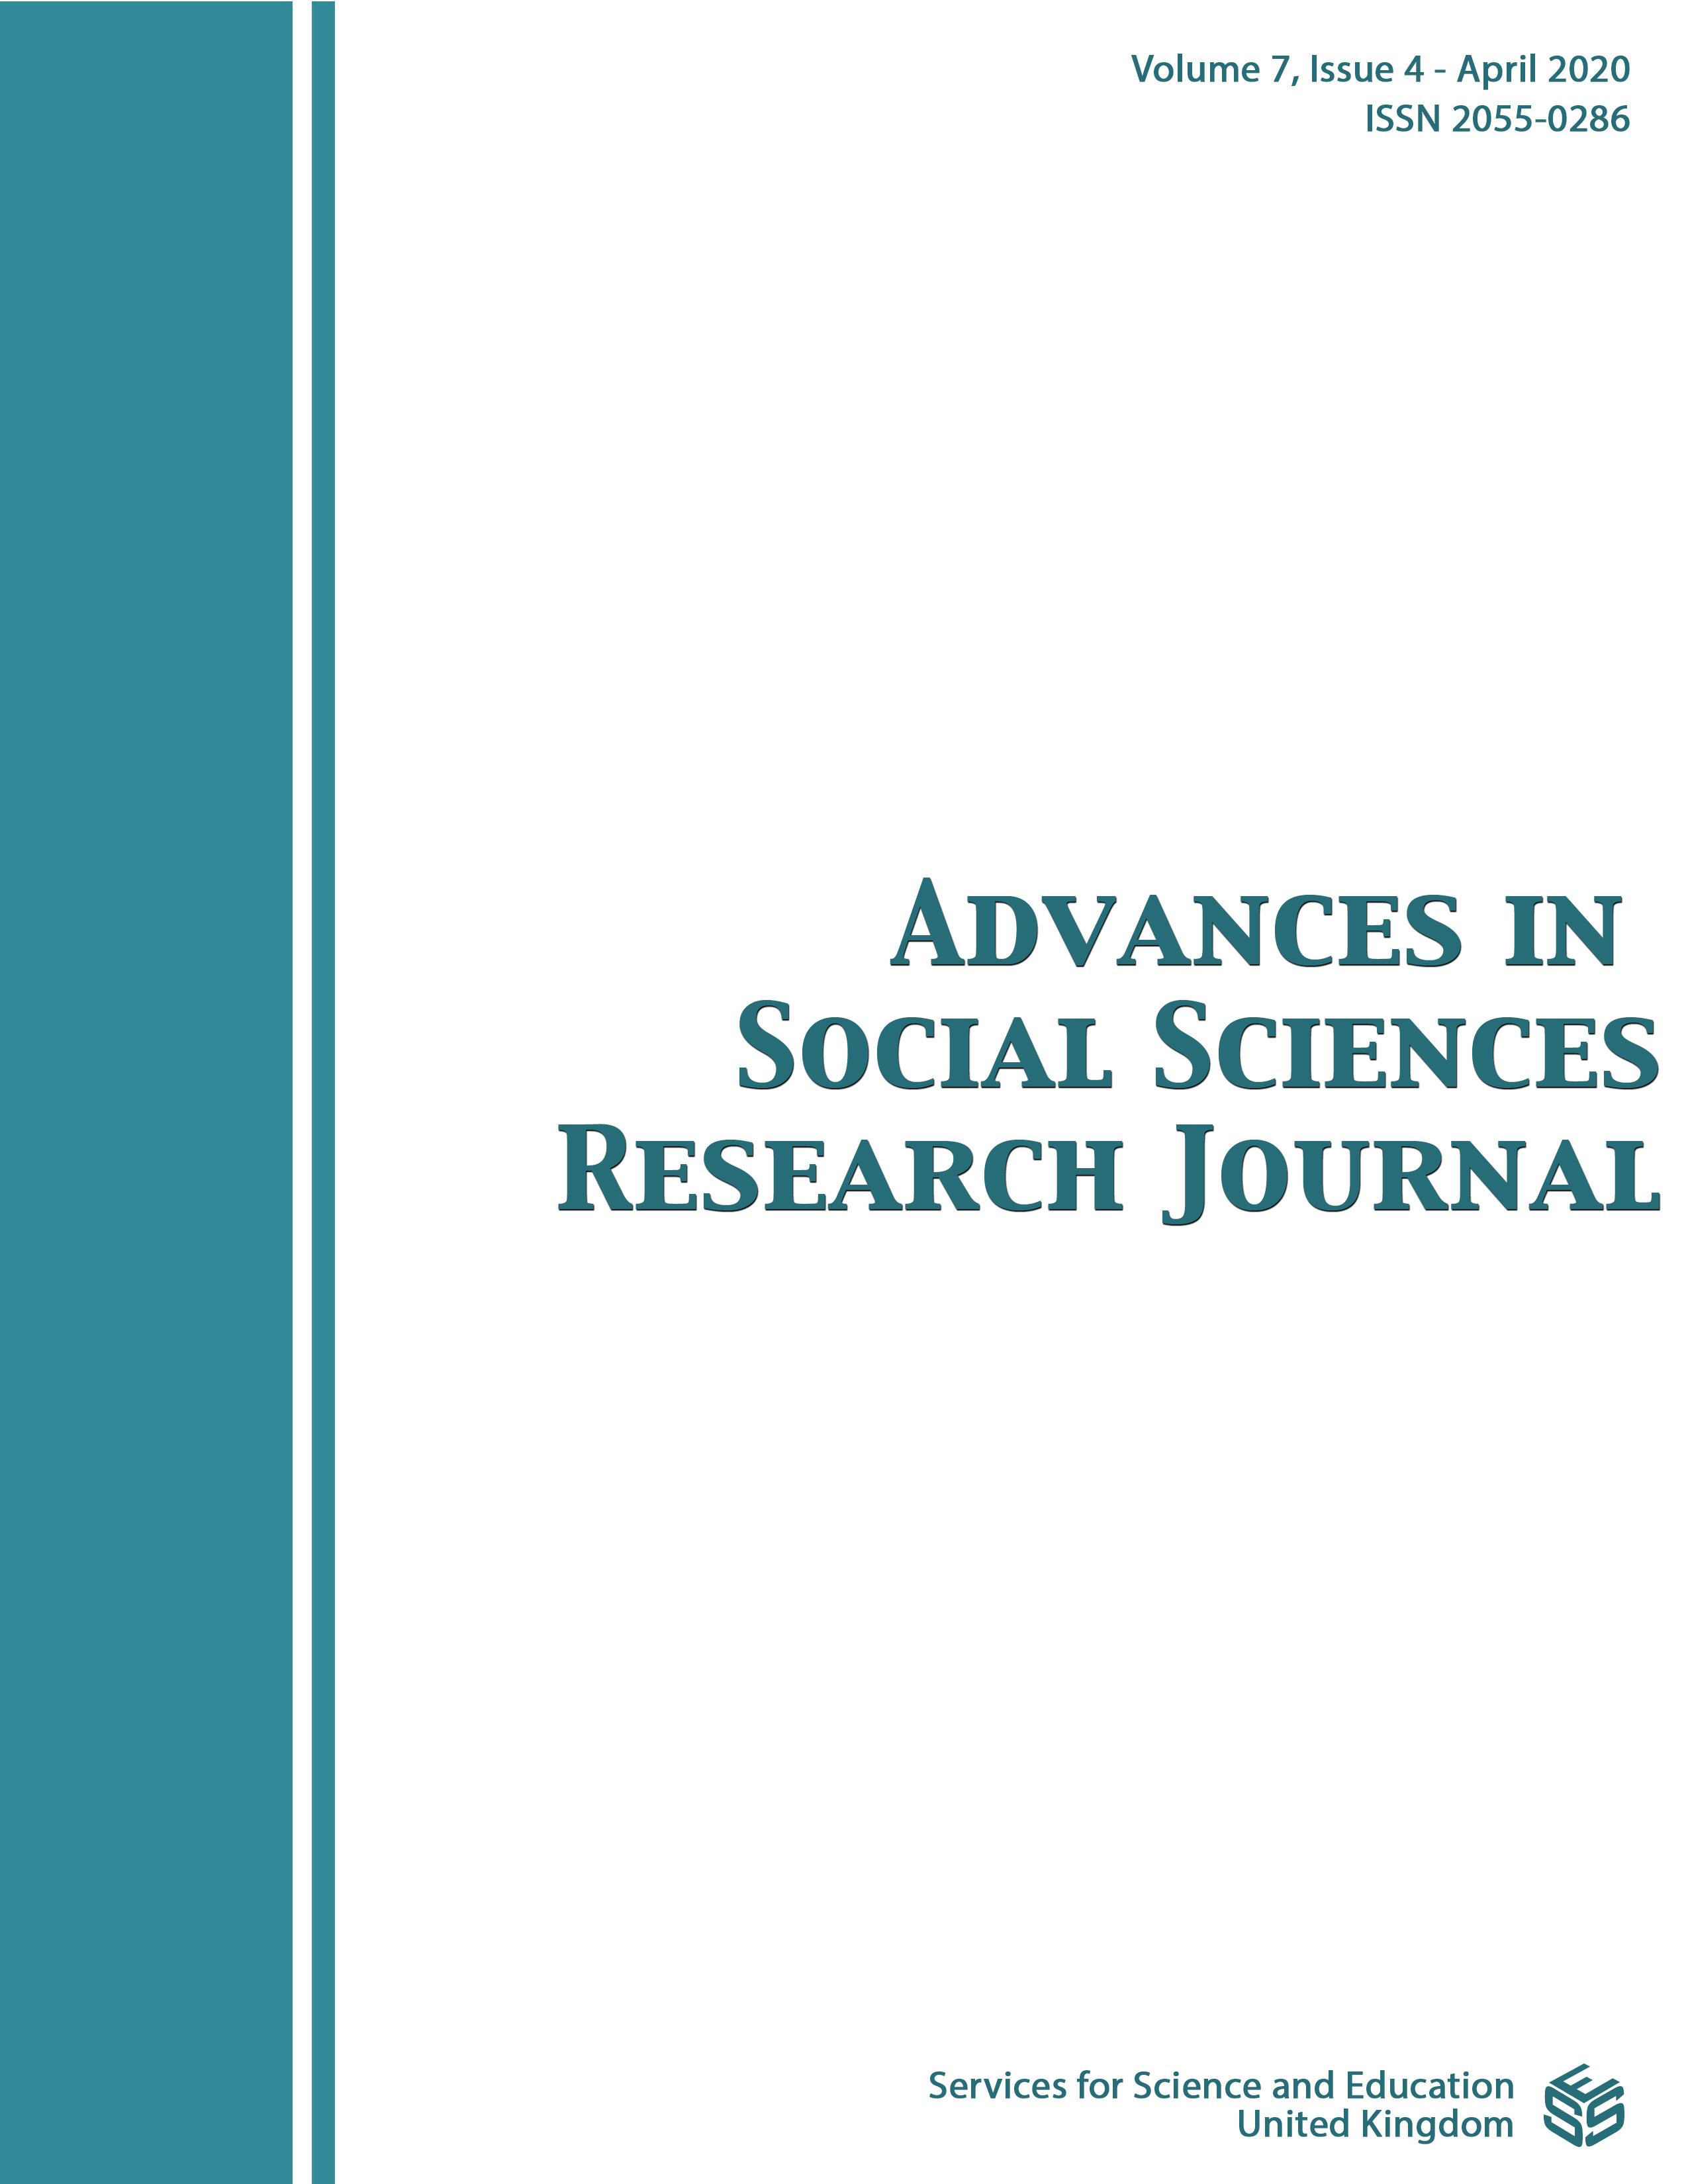 View Vol. 7 No. 4 (2020): Advances in Social Sciences Research Journal